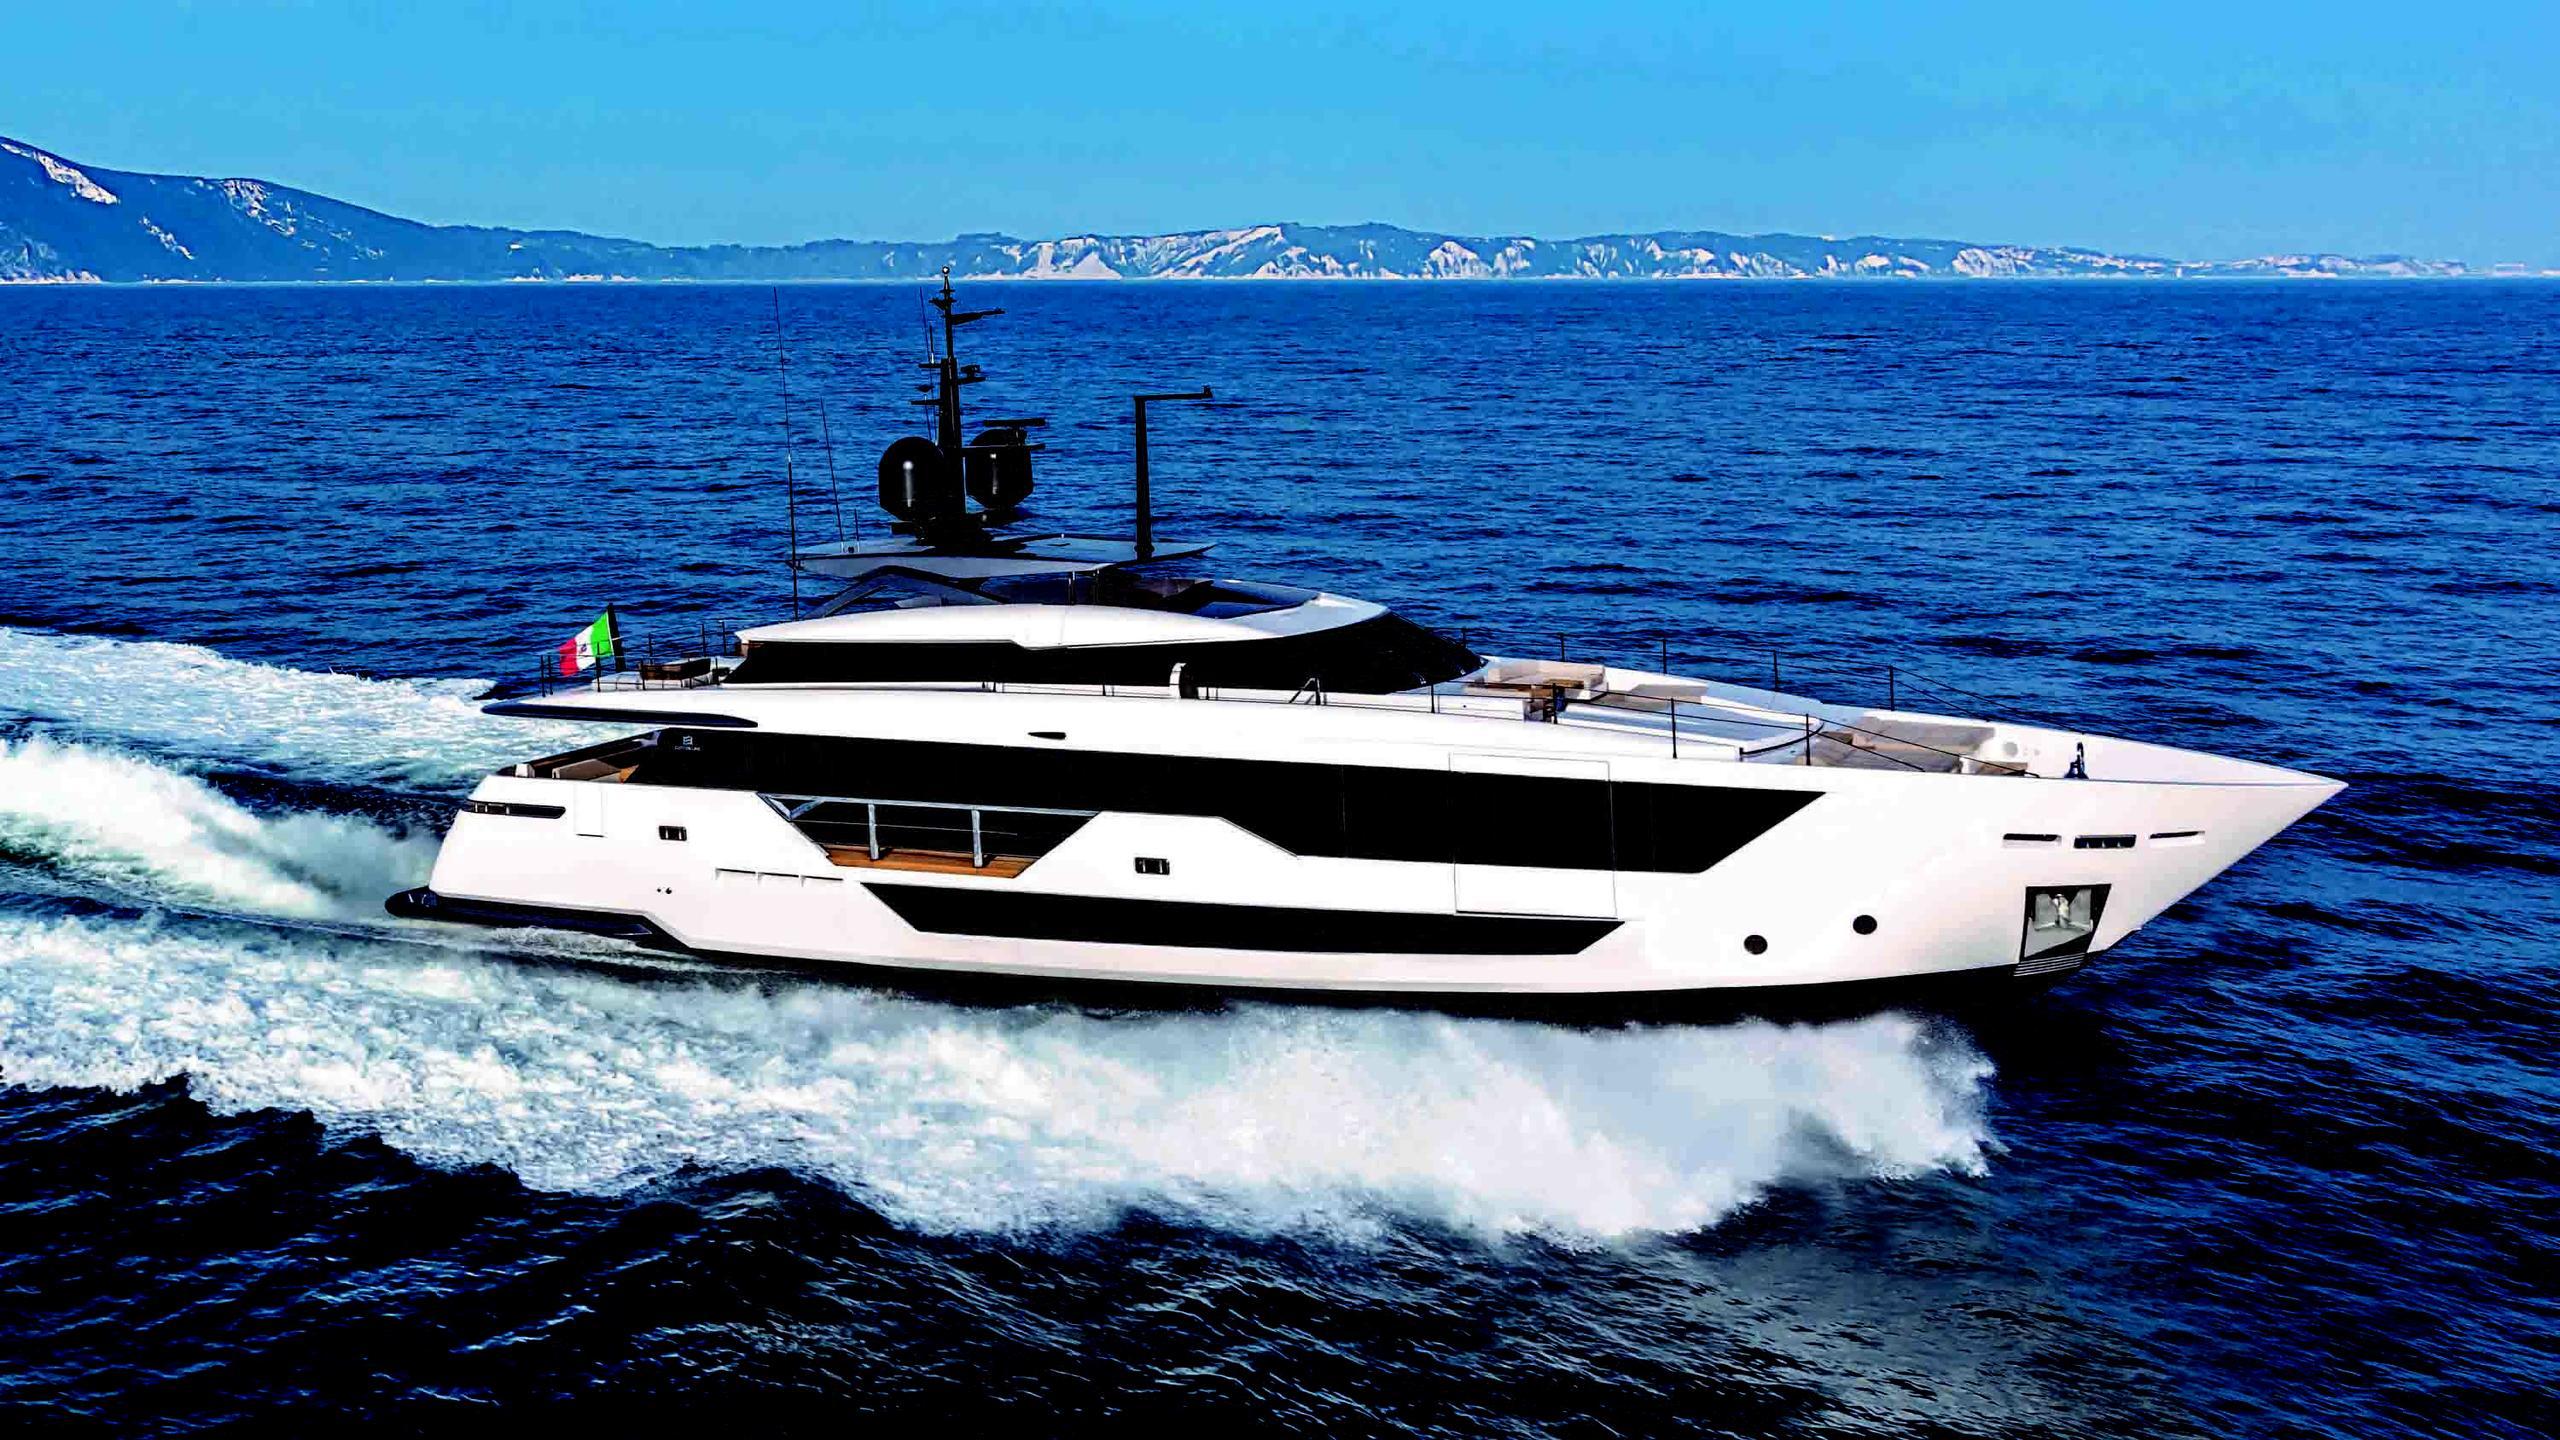 iv-dreams-motoryacht-ferretti-custom-line-106-33m-2019-half-profile